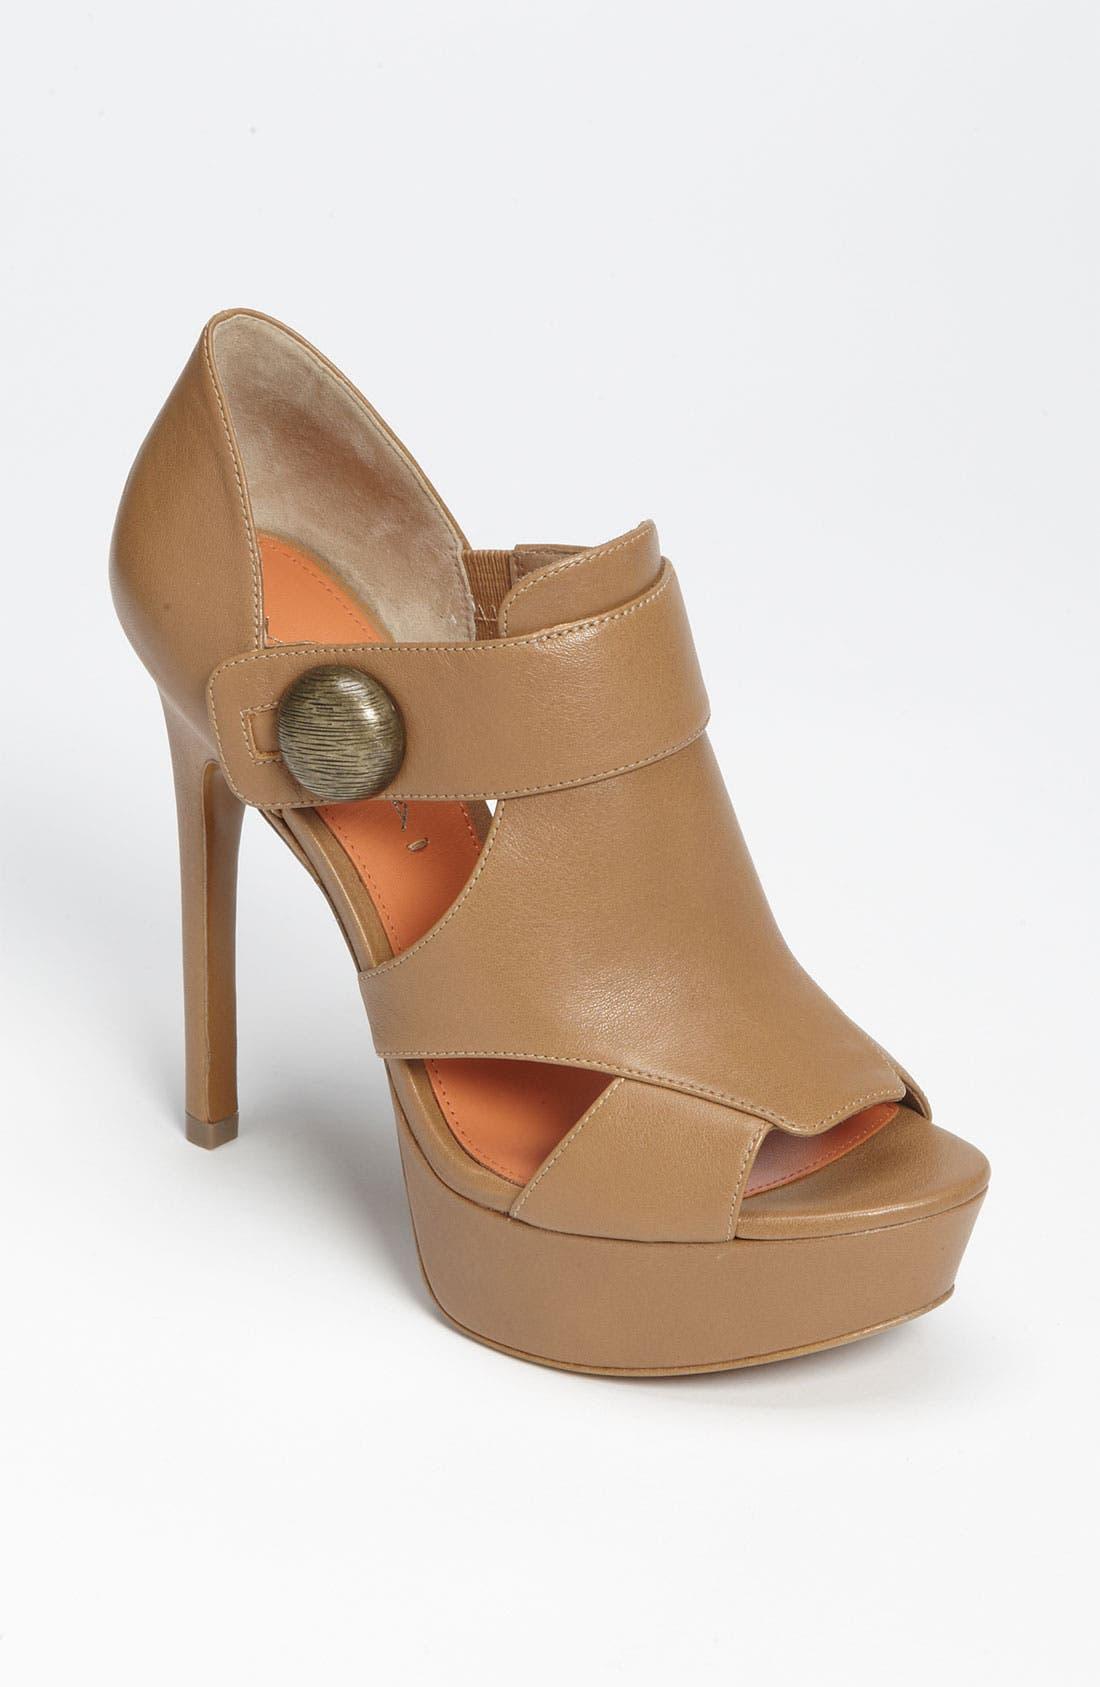 Alternate Image 1 Selected - Via Spiga 'Hartley' Sandal